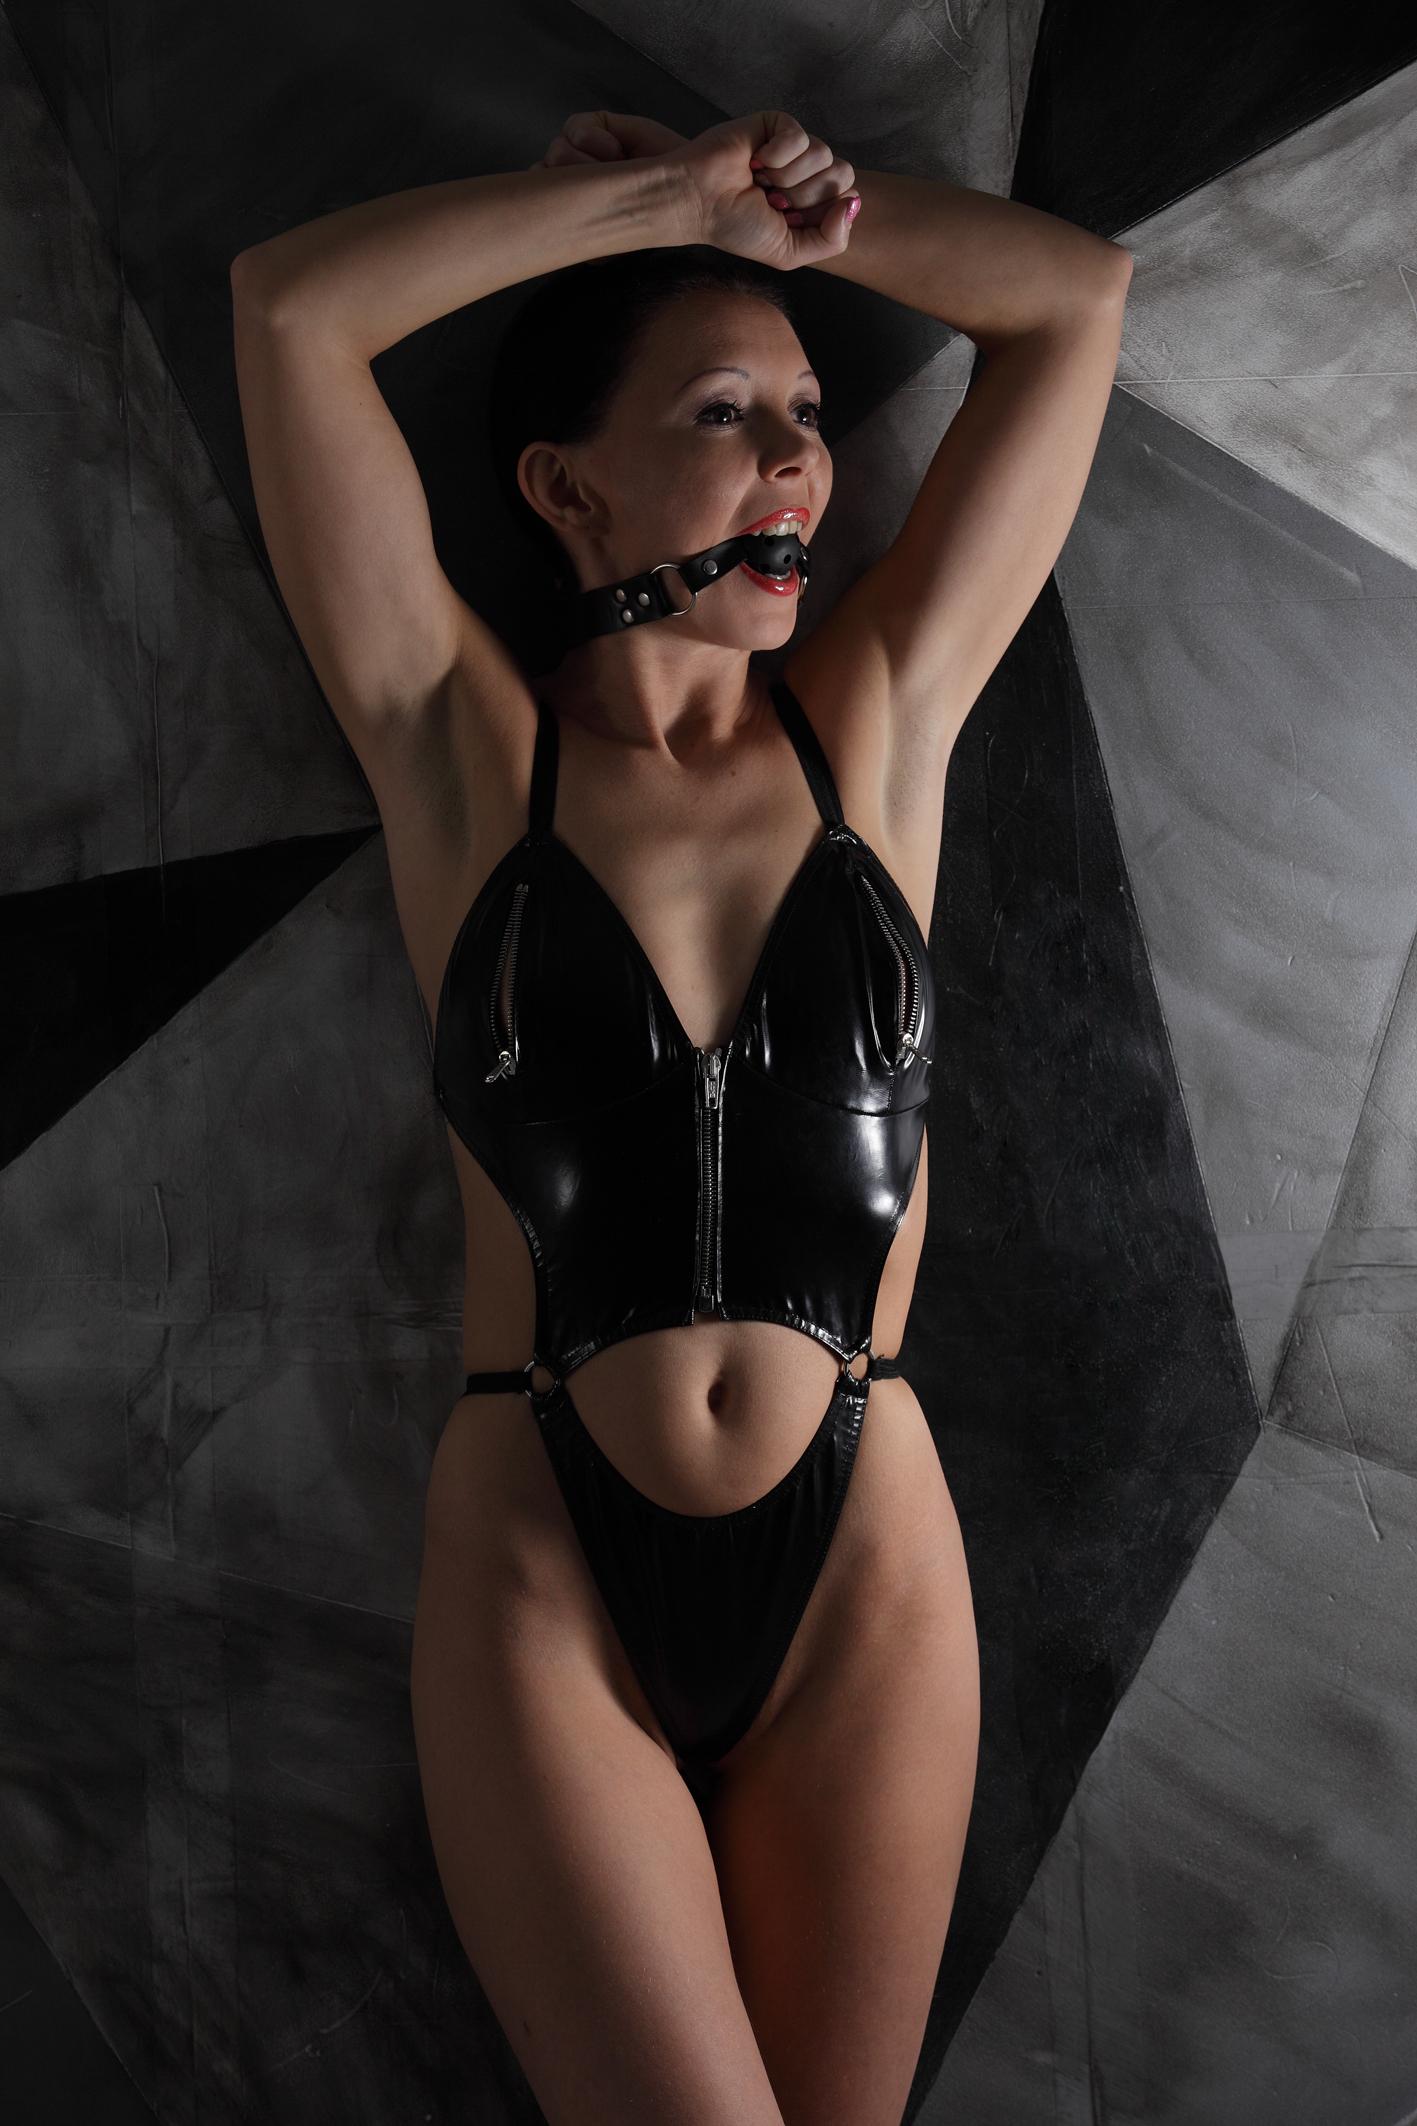 caesars palace club anal sex bilder